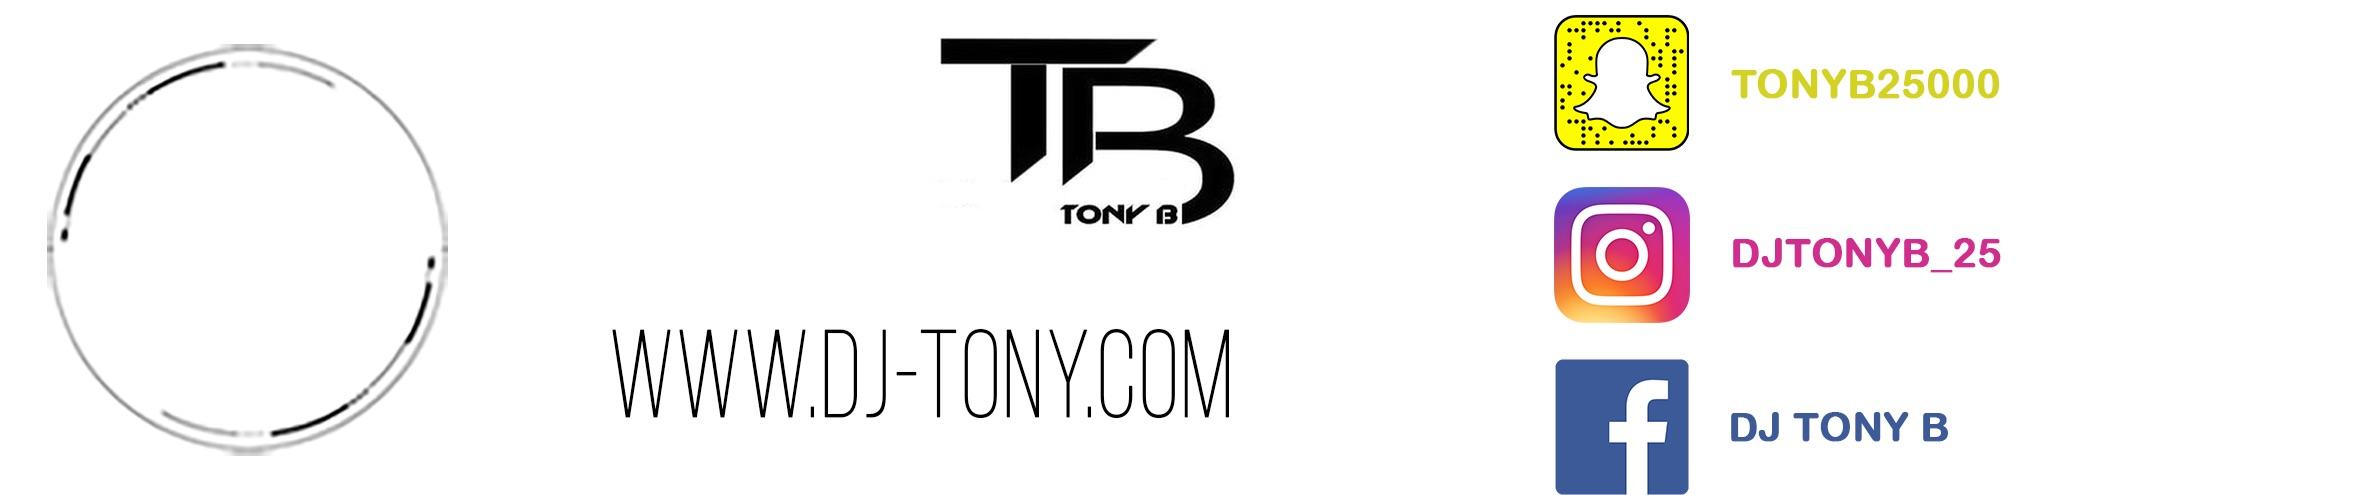 Bramsito Feat  Booba - Sale Mood (Tony B Transition Edit